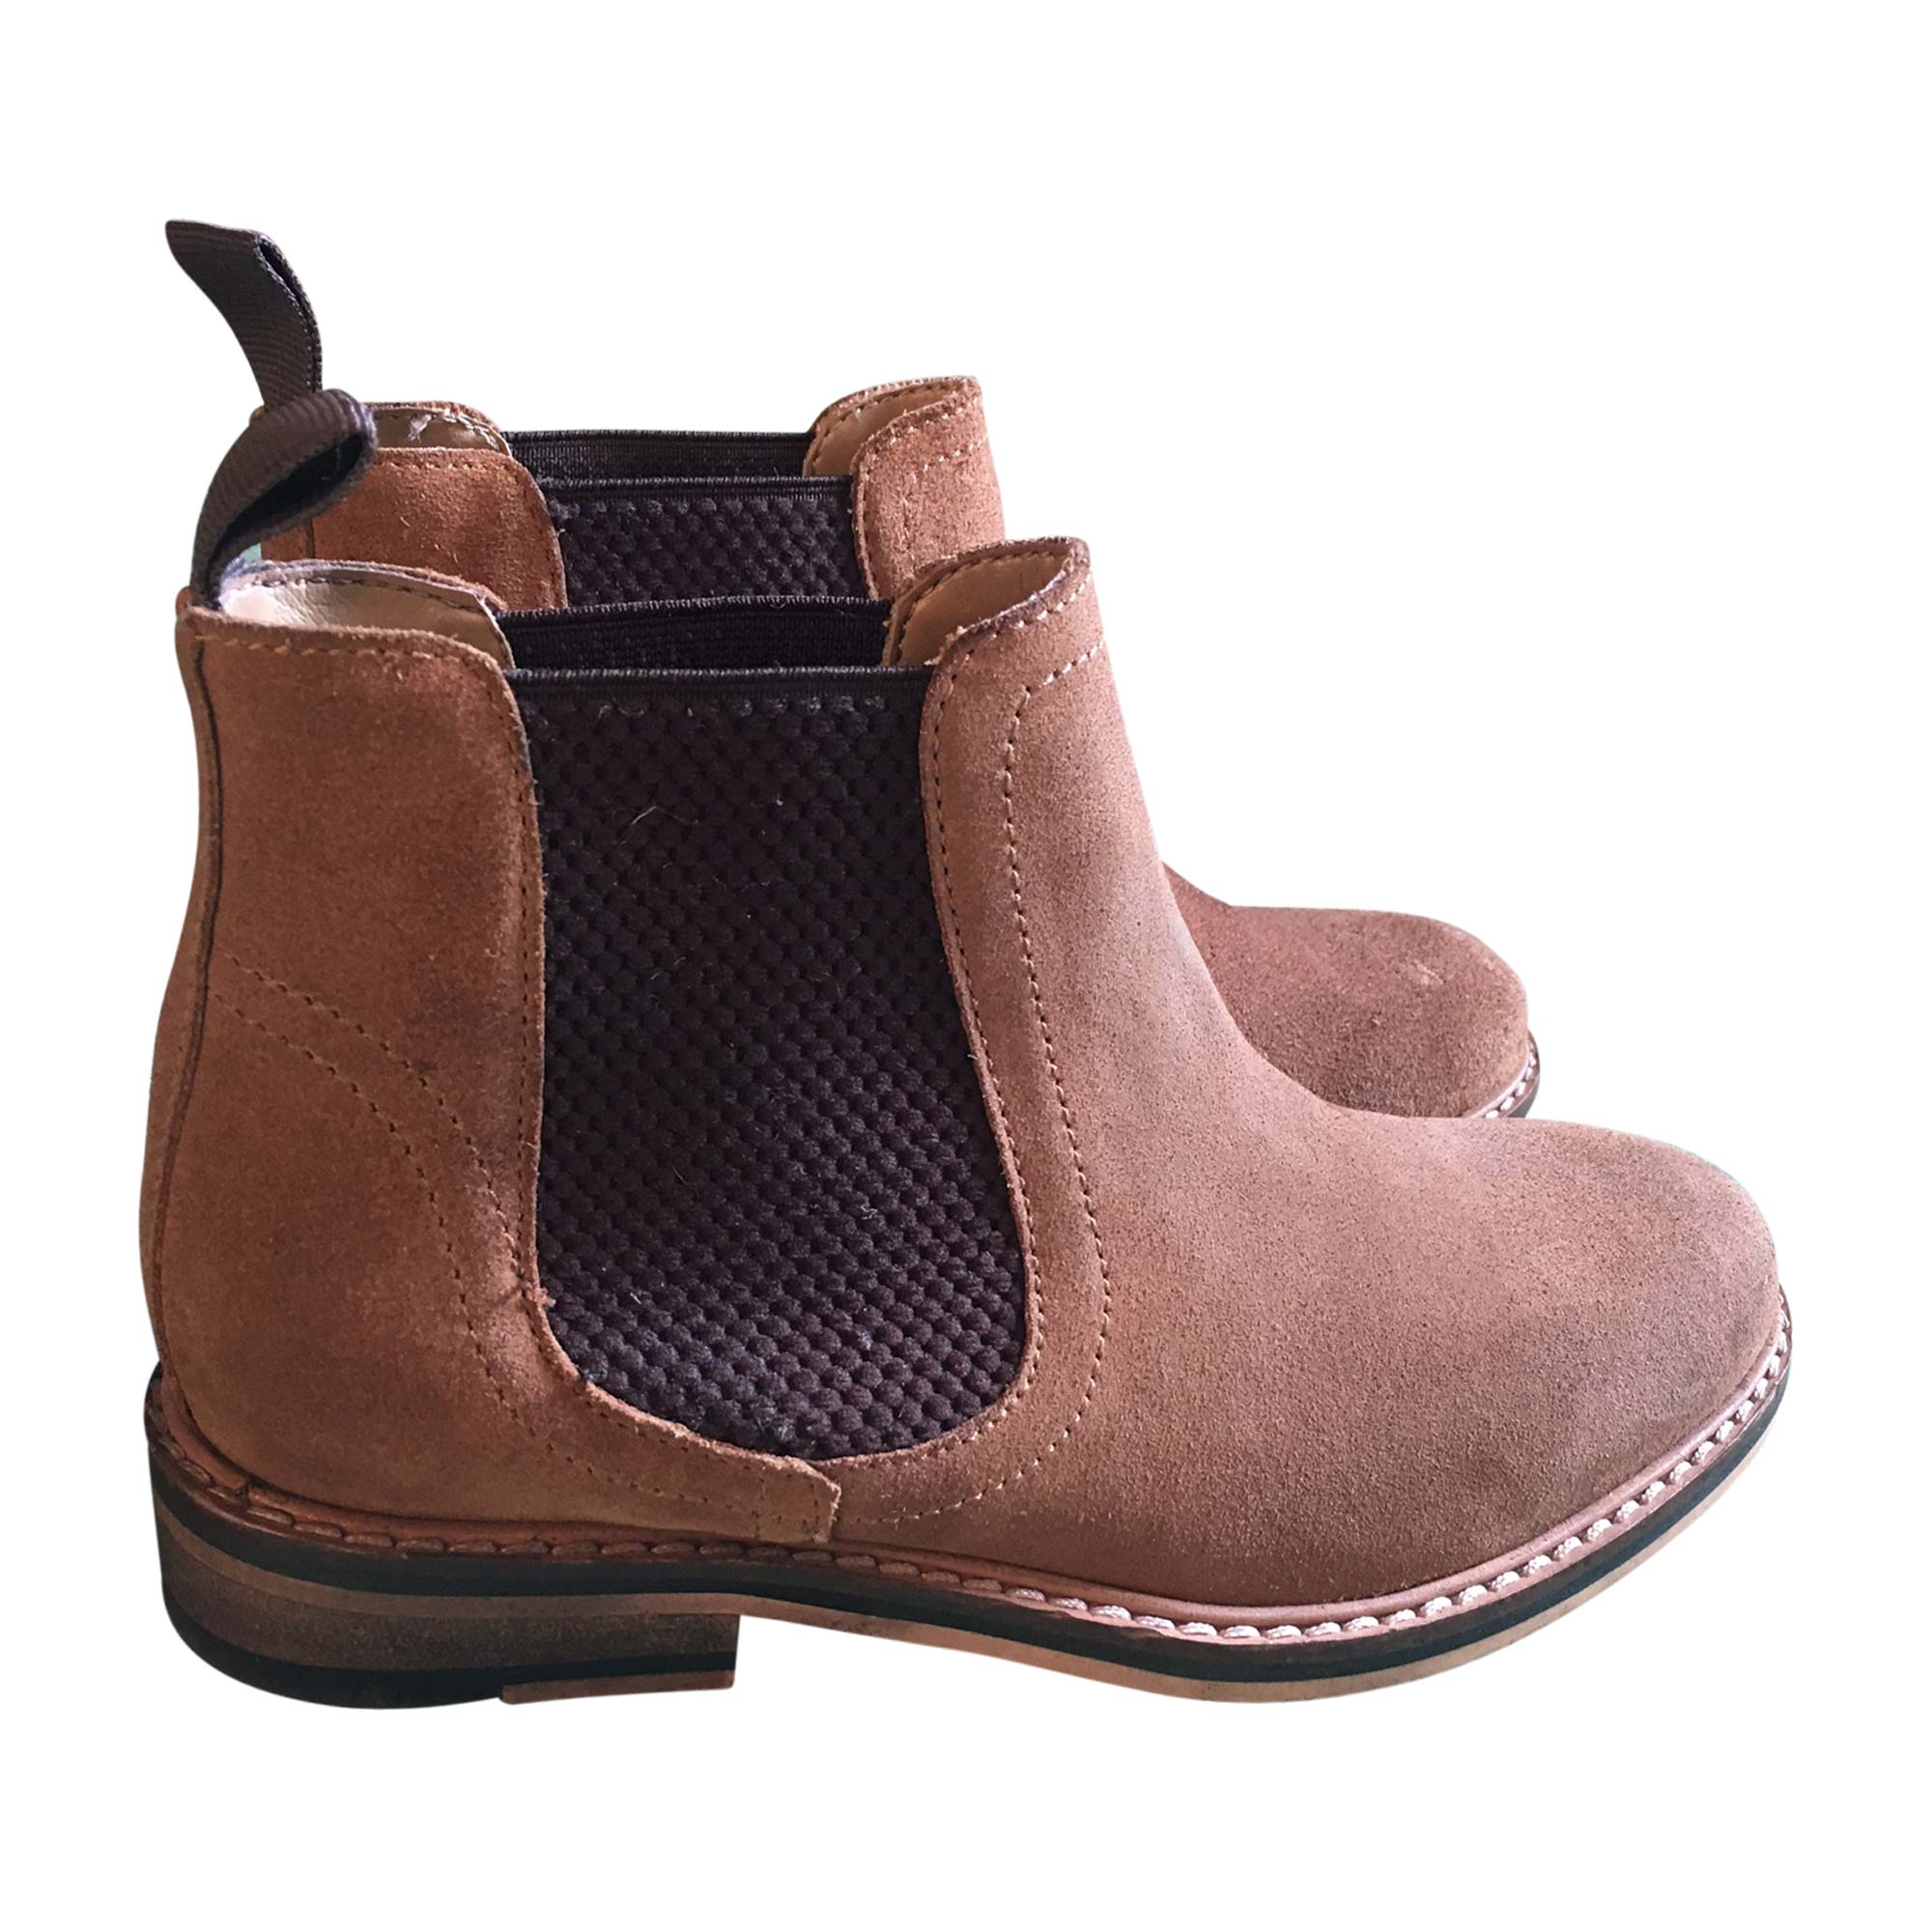 Bottines & low boots plates ASOS Marron